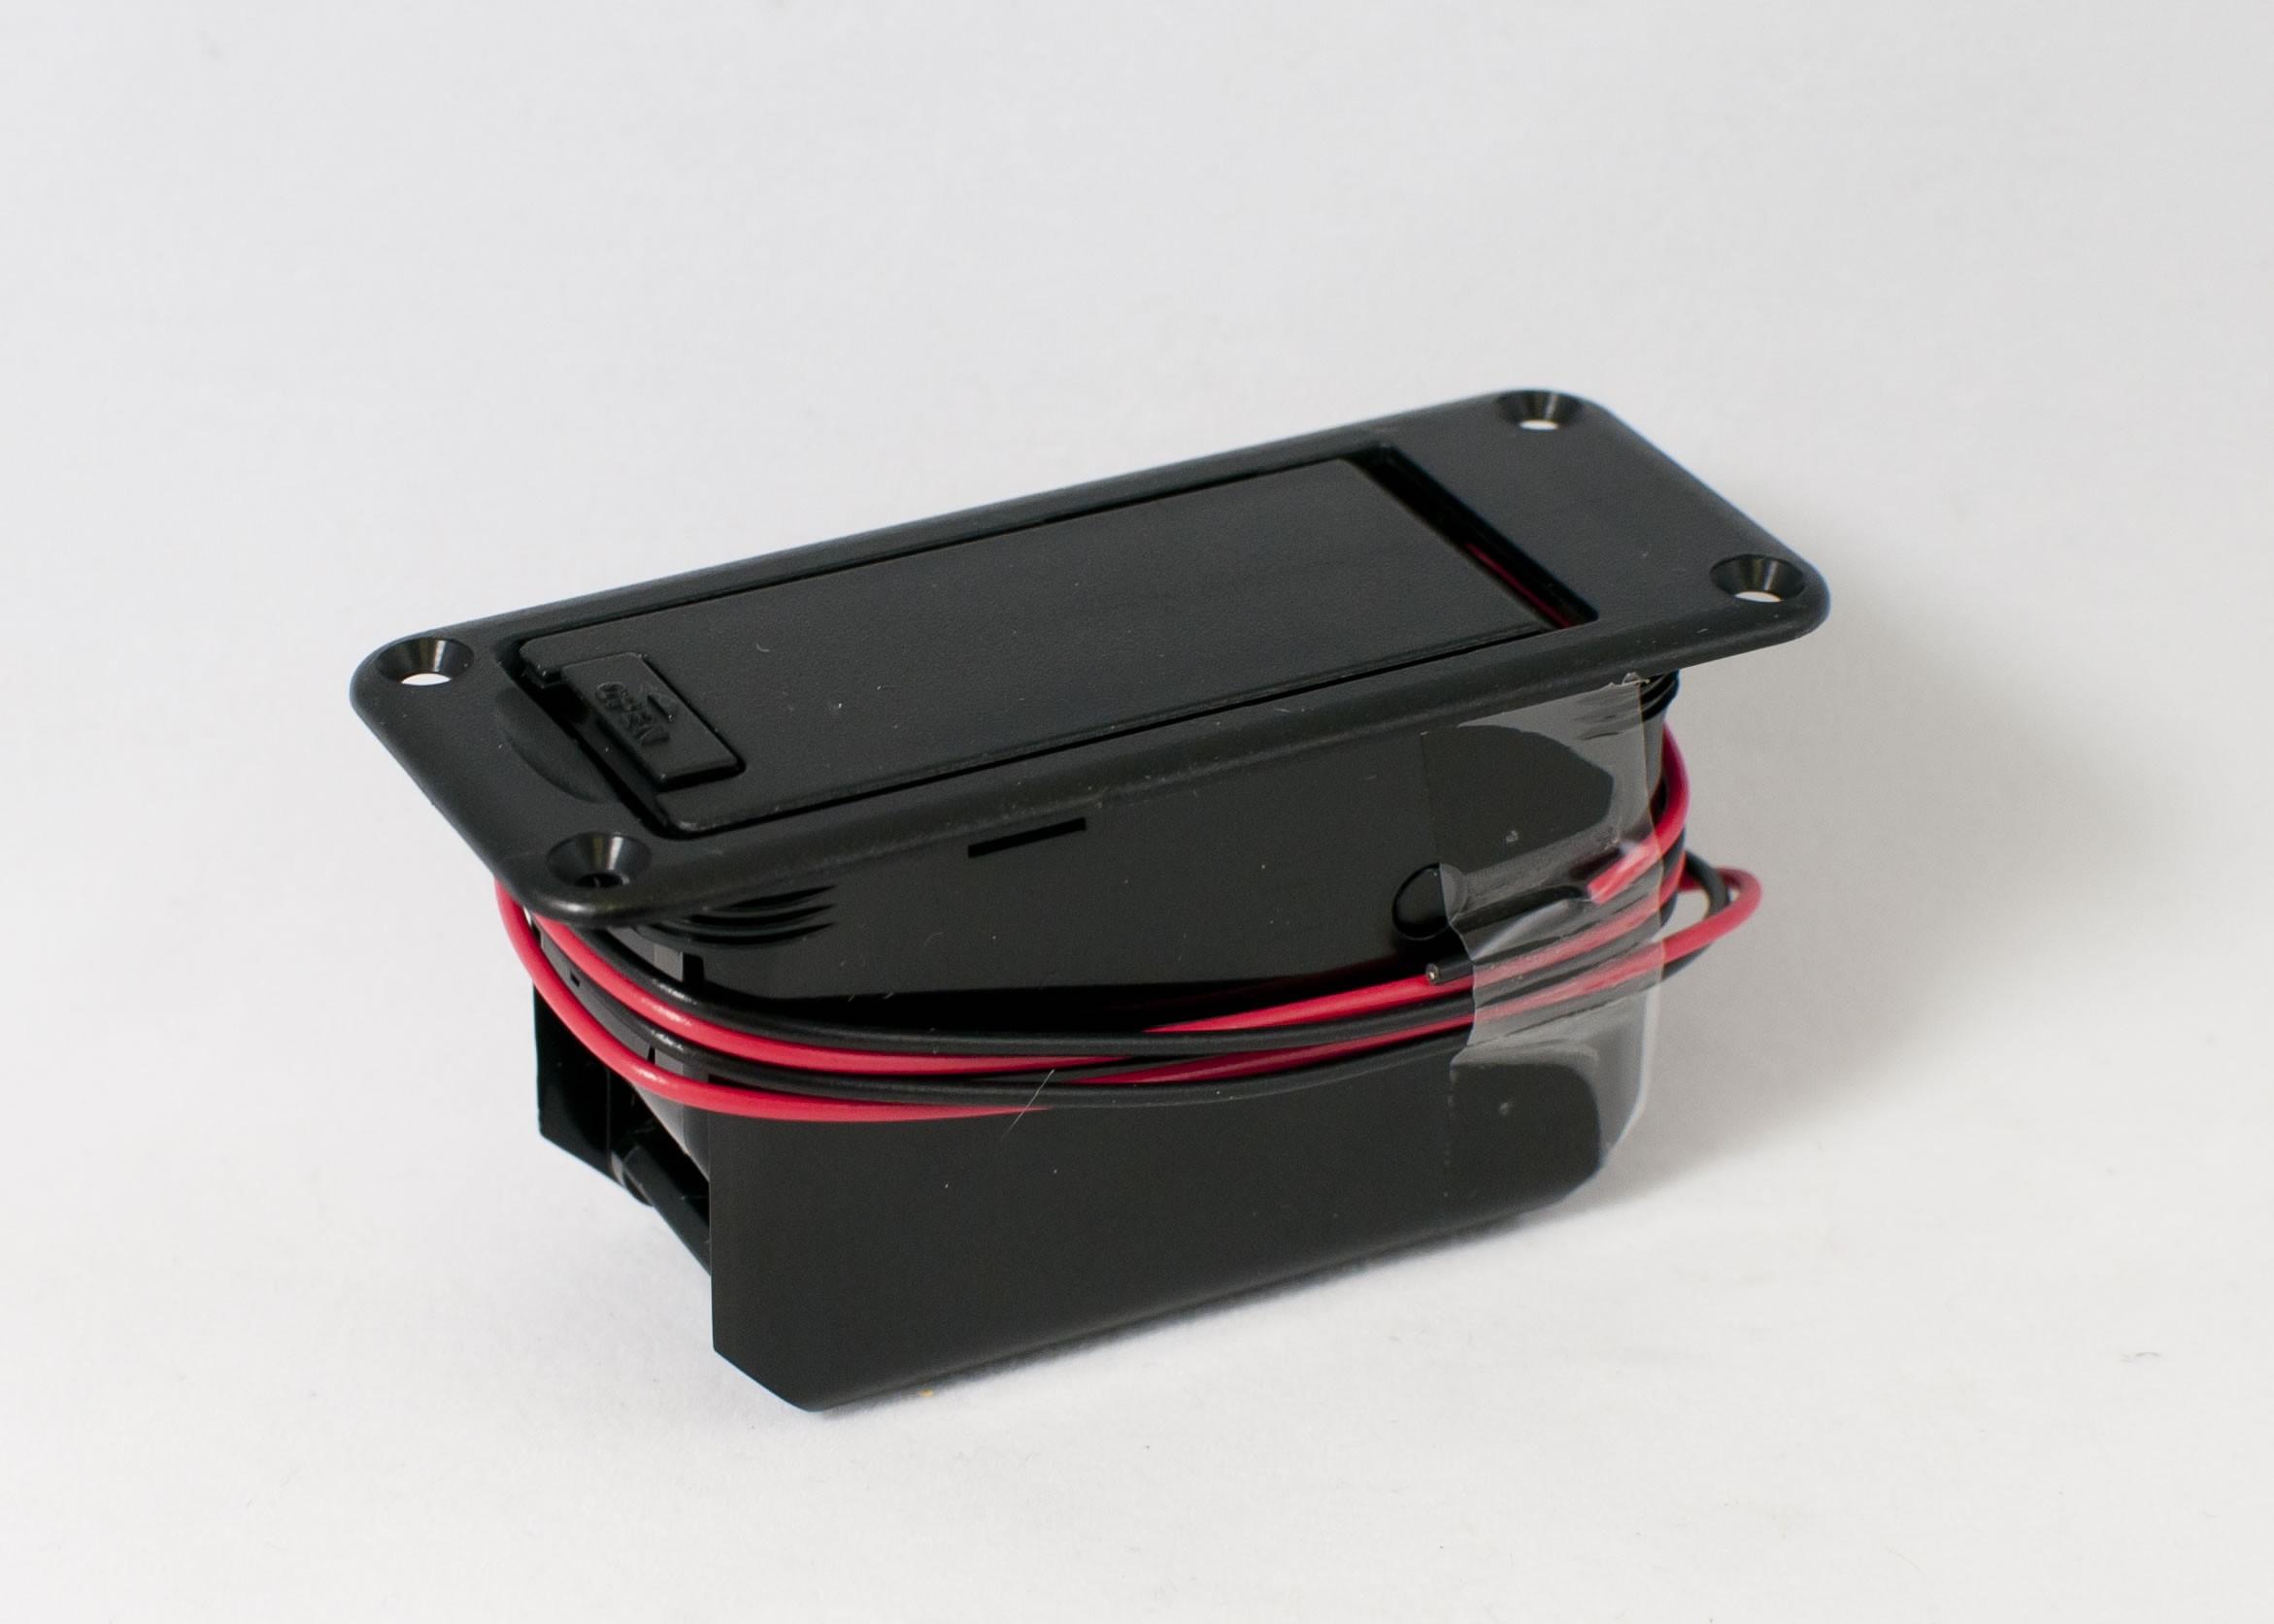 9v Volt Top Mount Battery Compartment - Best B Gear  Volt Battery Wiring Harness on 9 volt power supply, 9 volt battery cover, 9 volt speaker, 9 volt switch, 9 volt battery terminal,